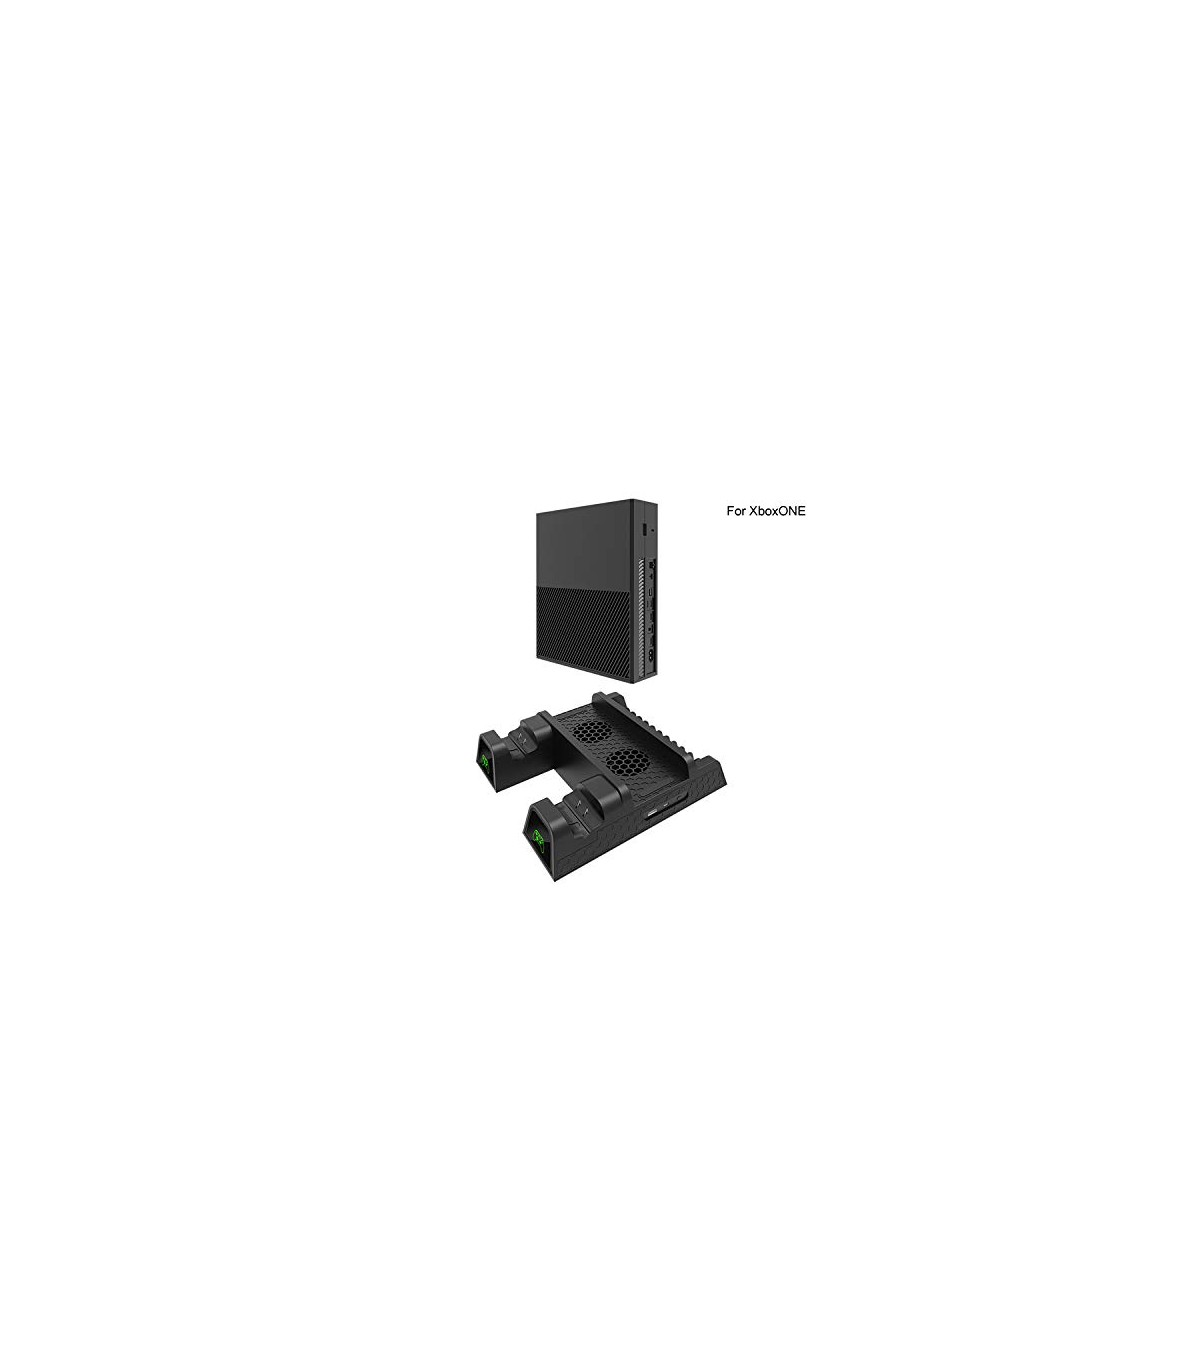 پایه چندکاره ایکس باکس وان DOBE Xbox One Multifunctional Cooler